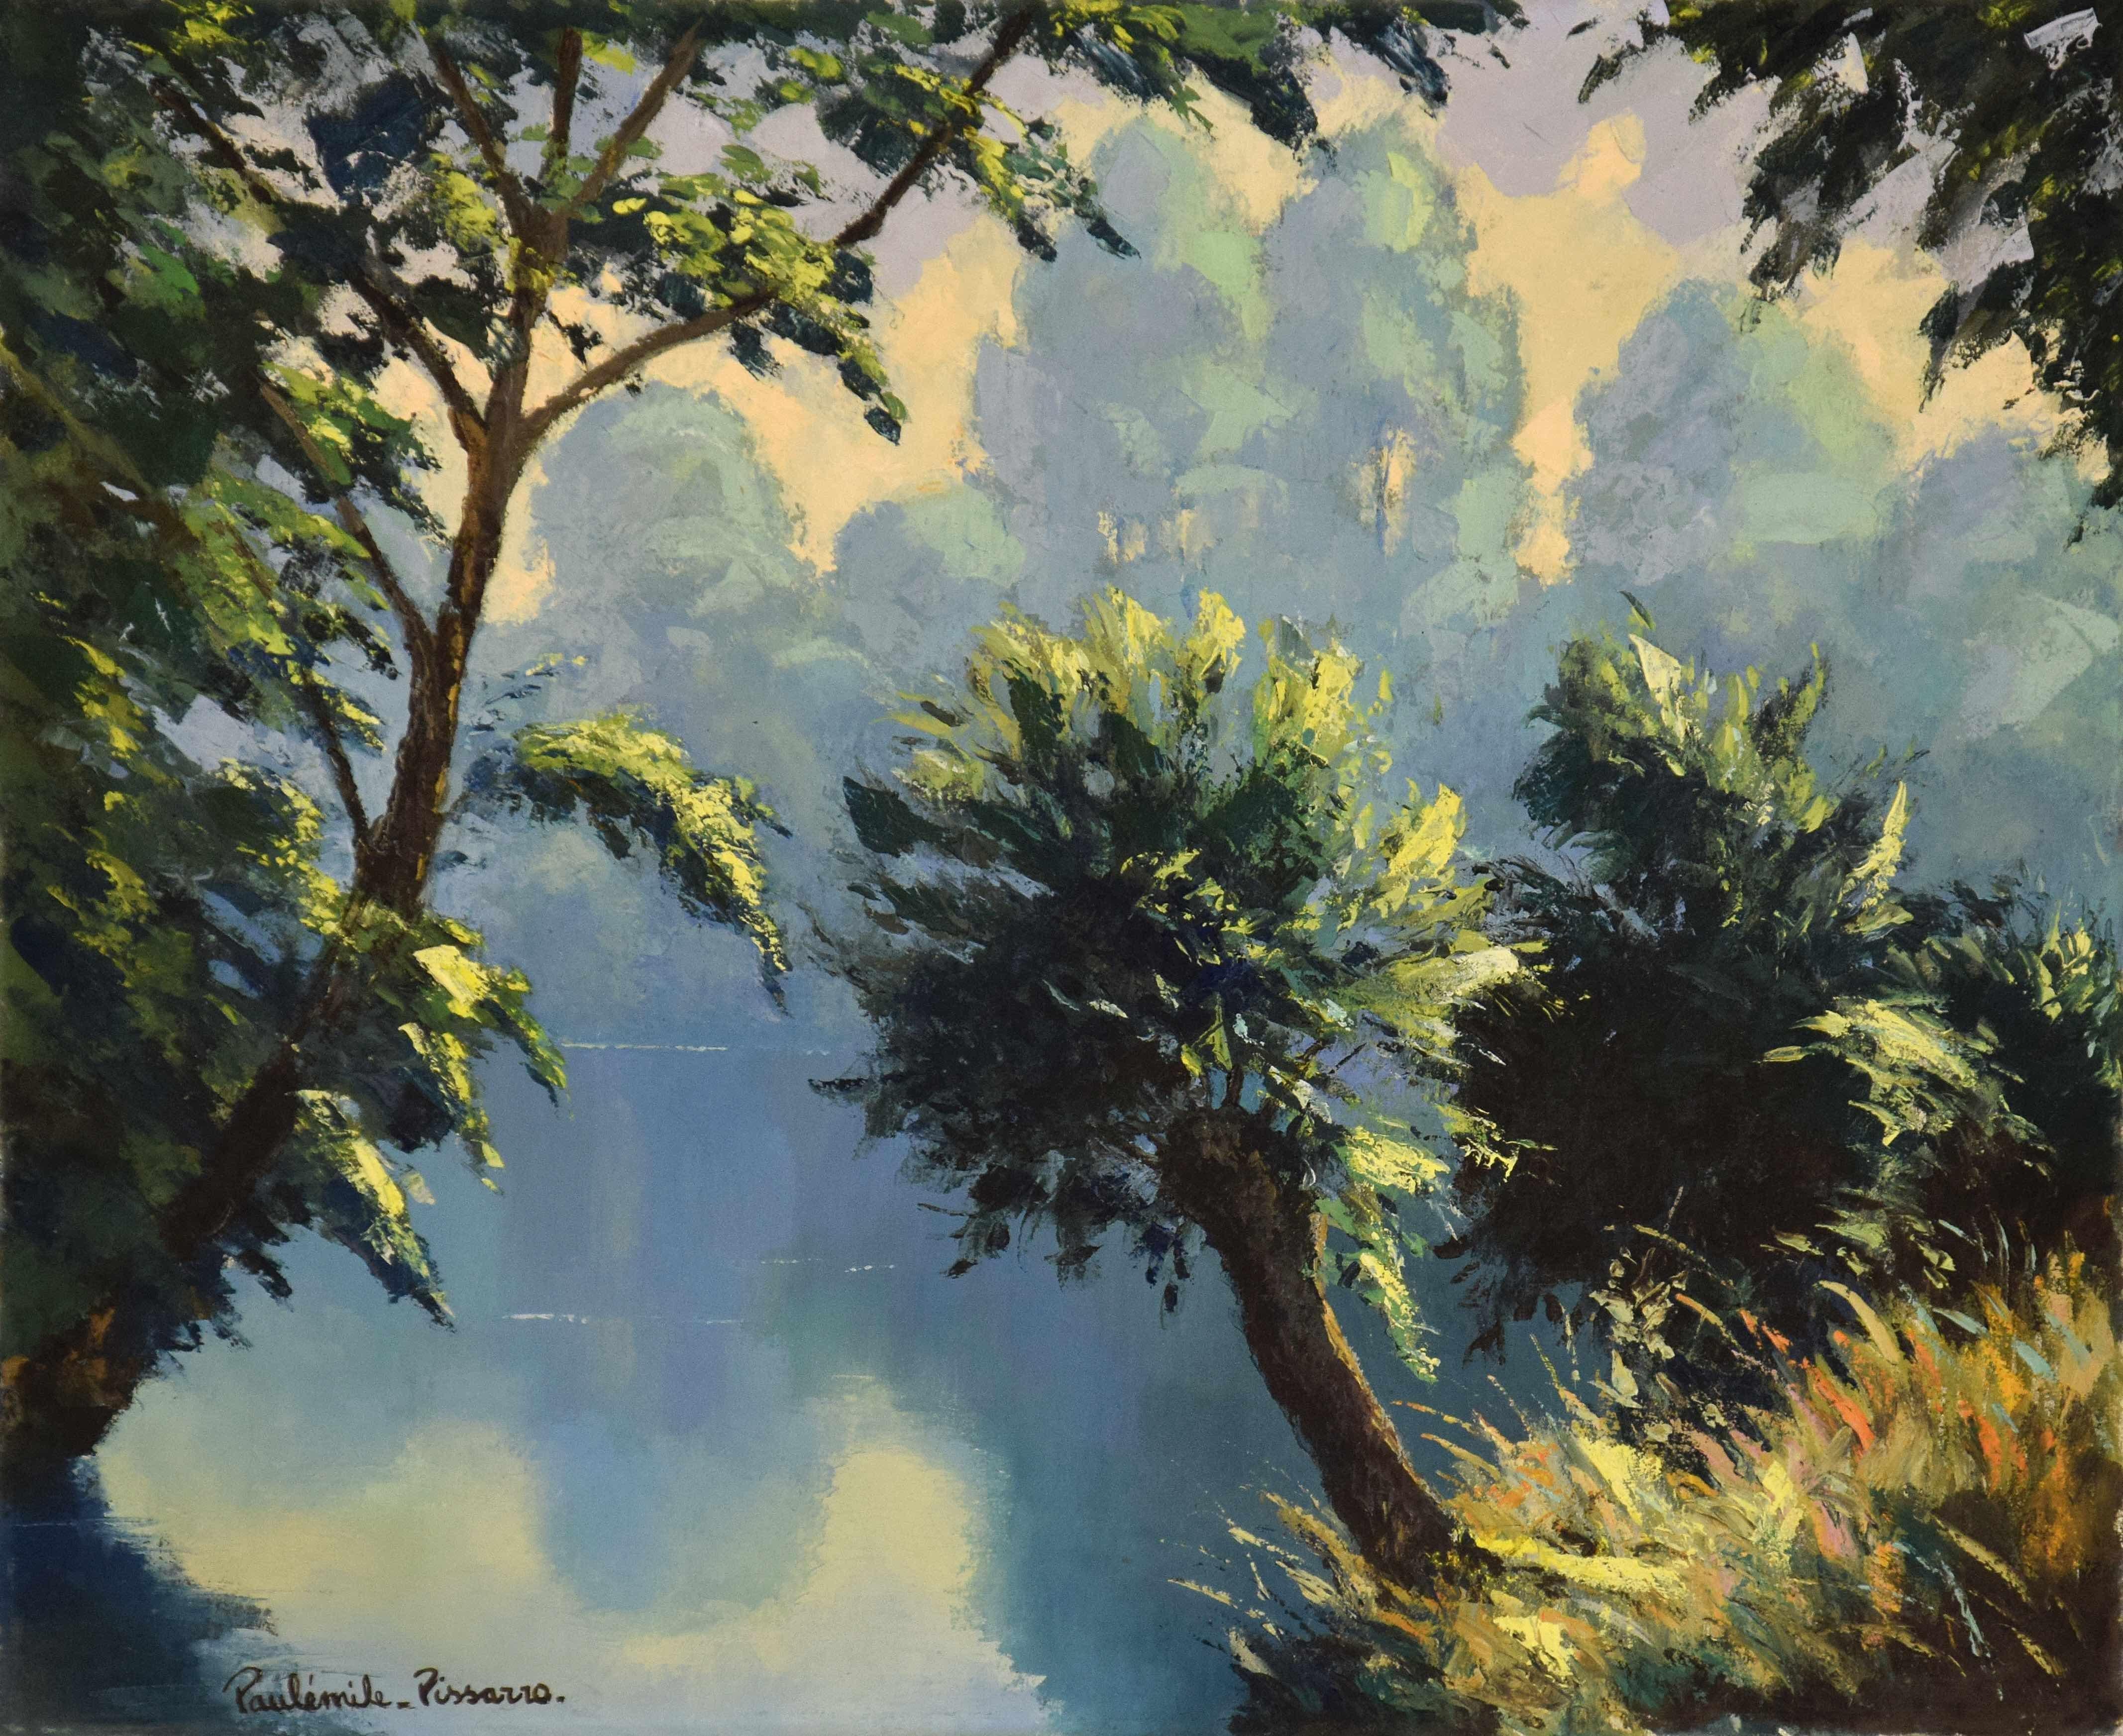 Brume Matinale by Paulémile Pissarro - Post-Impressionist  landscape painting